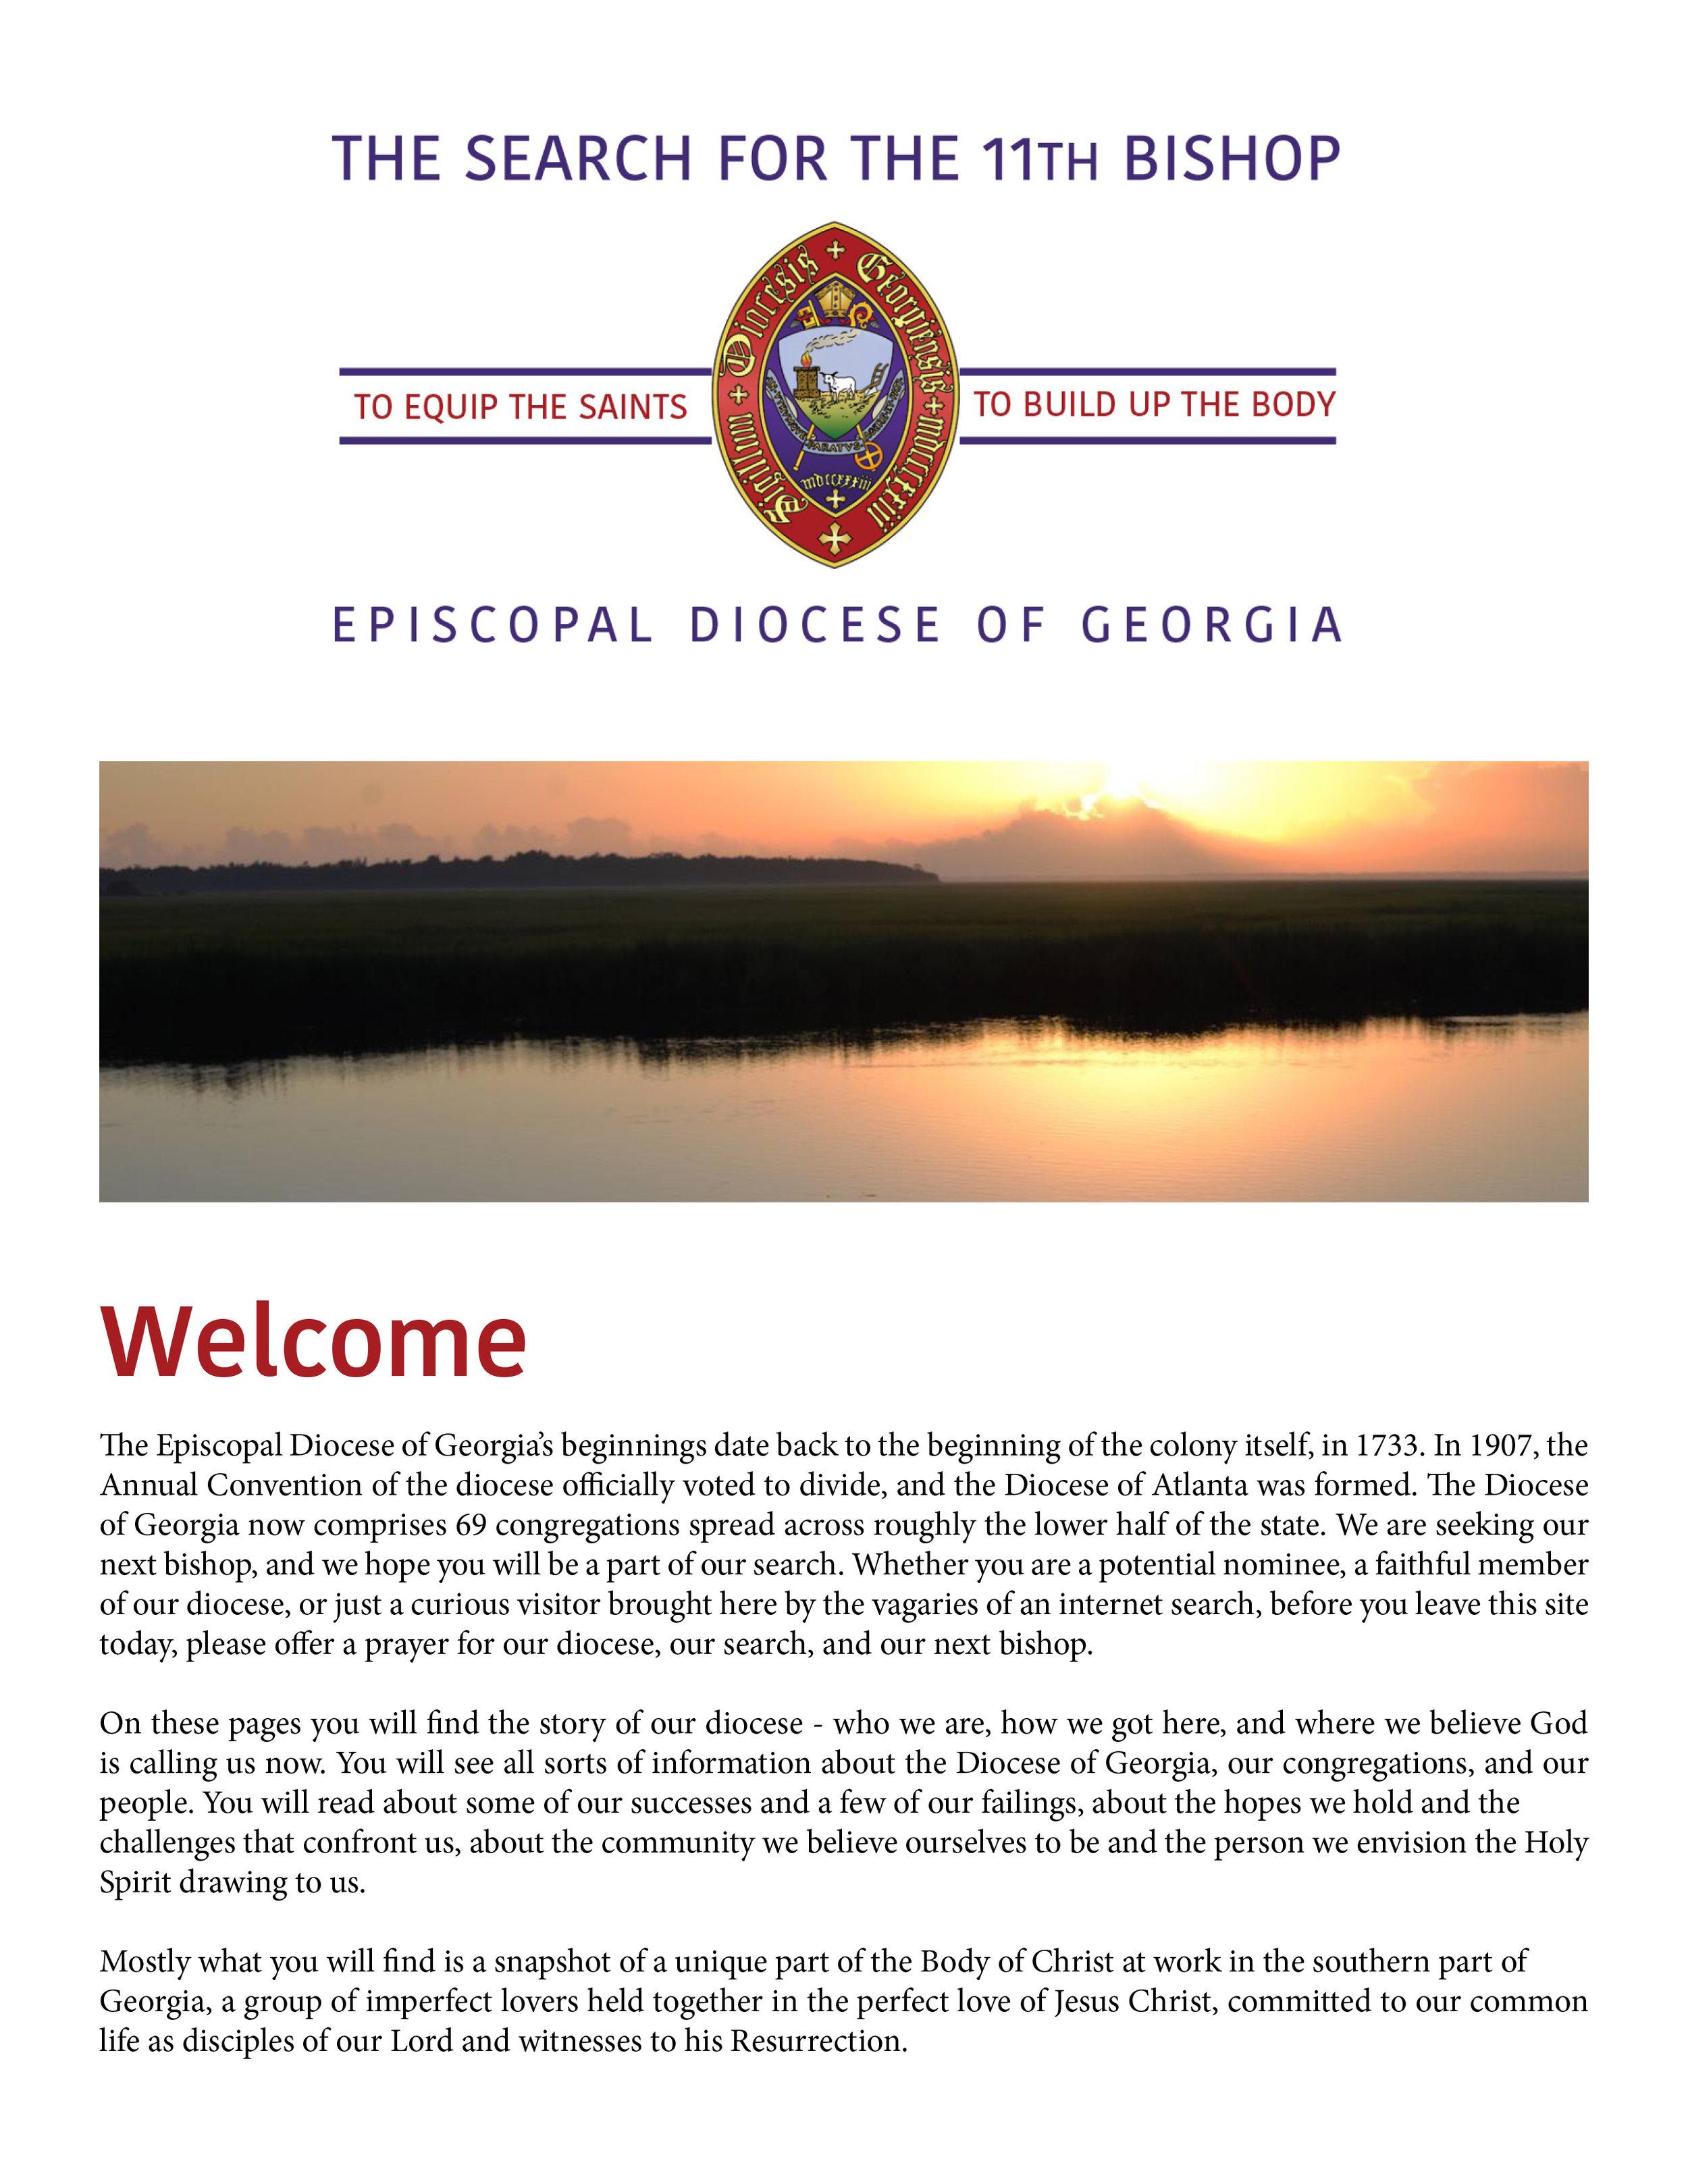 Online Newsletter-Diocean Publication_050719_Final.jpg